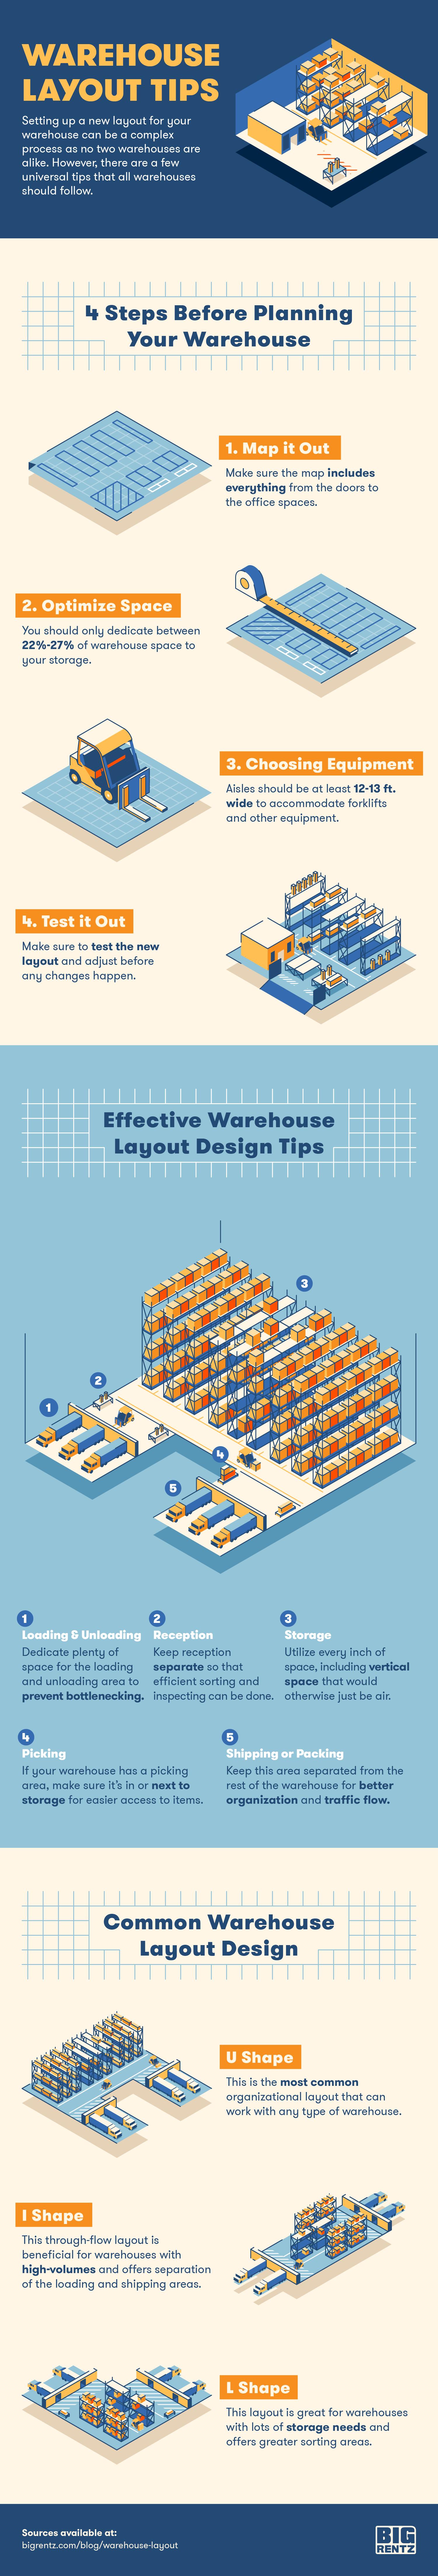 BigRentz warehouse layout infographic